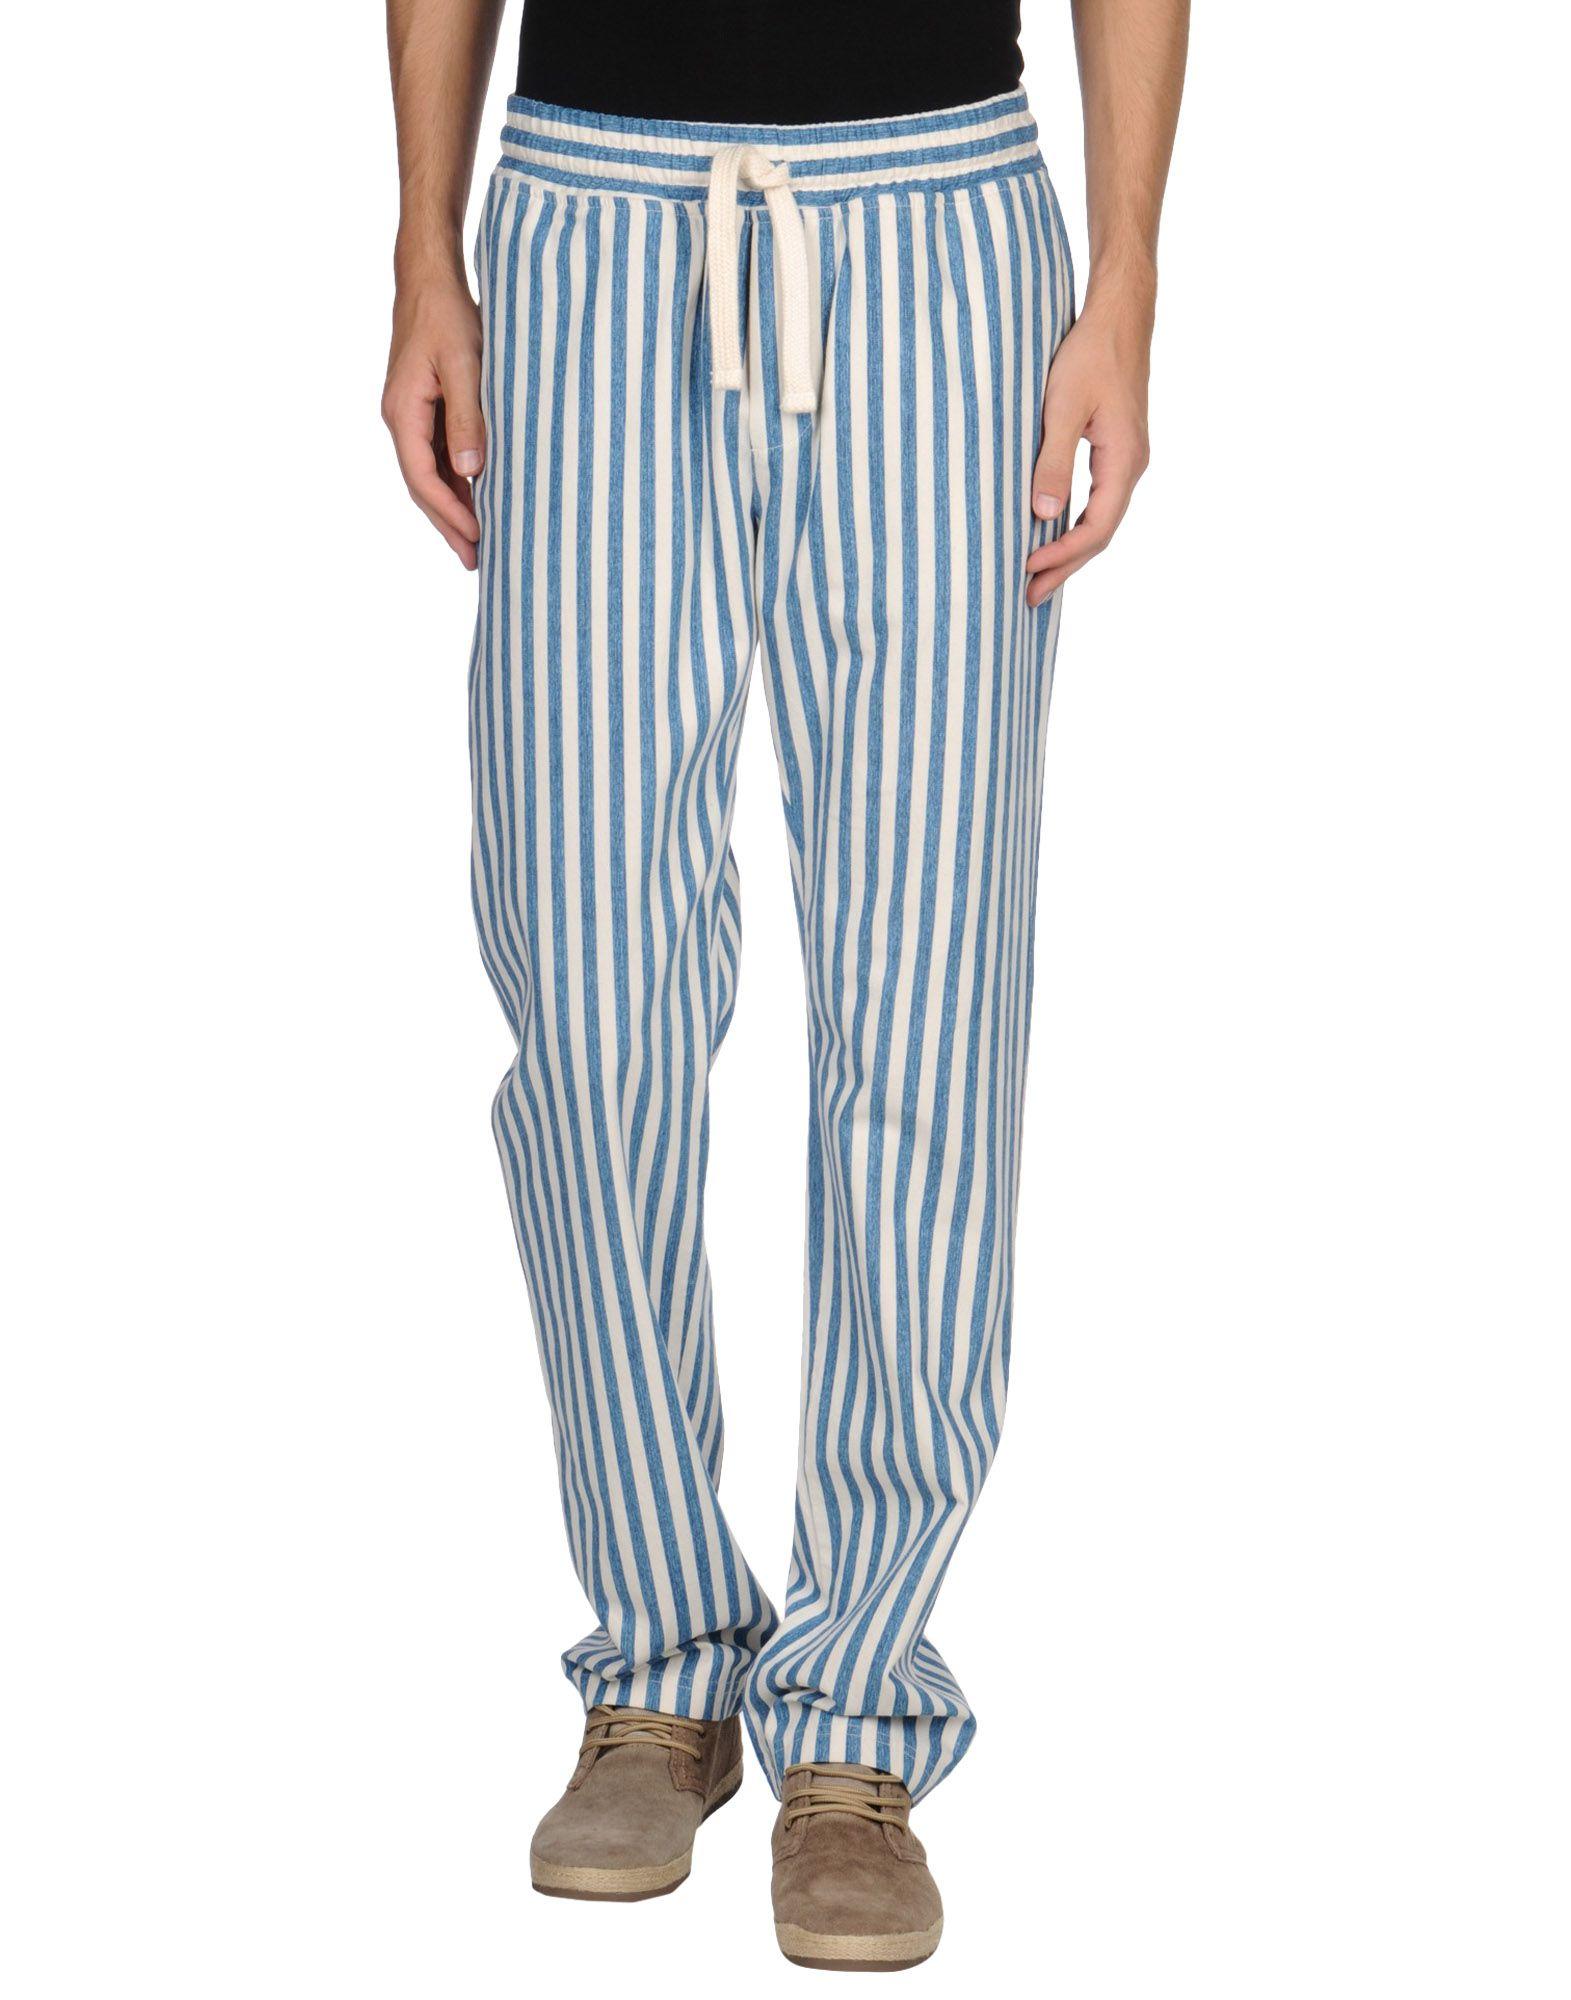 ALAIN Herren Jeanshose Farbe Azurblau Größe 6